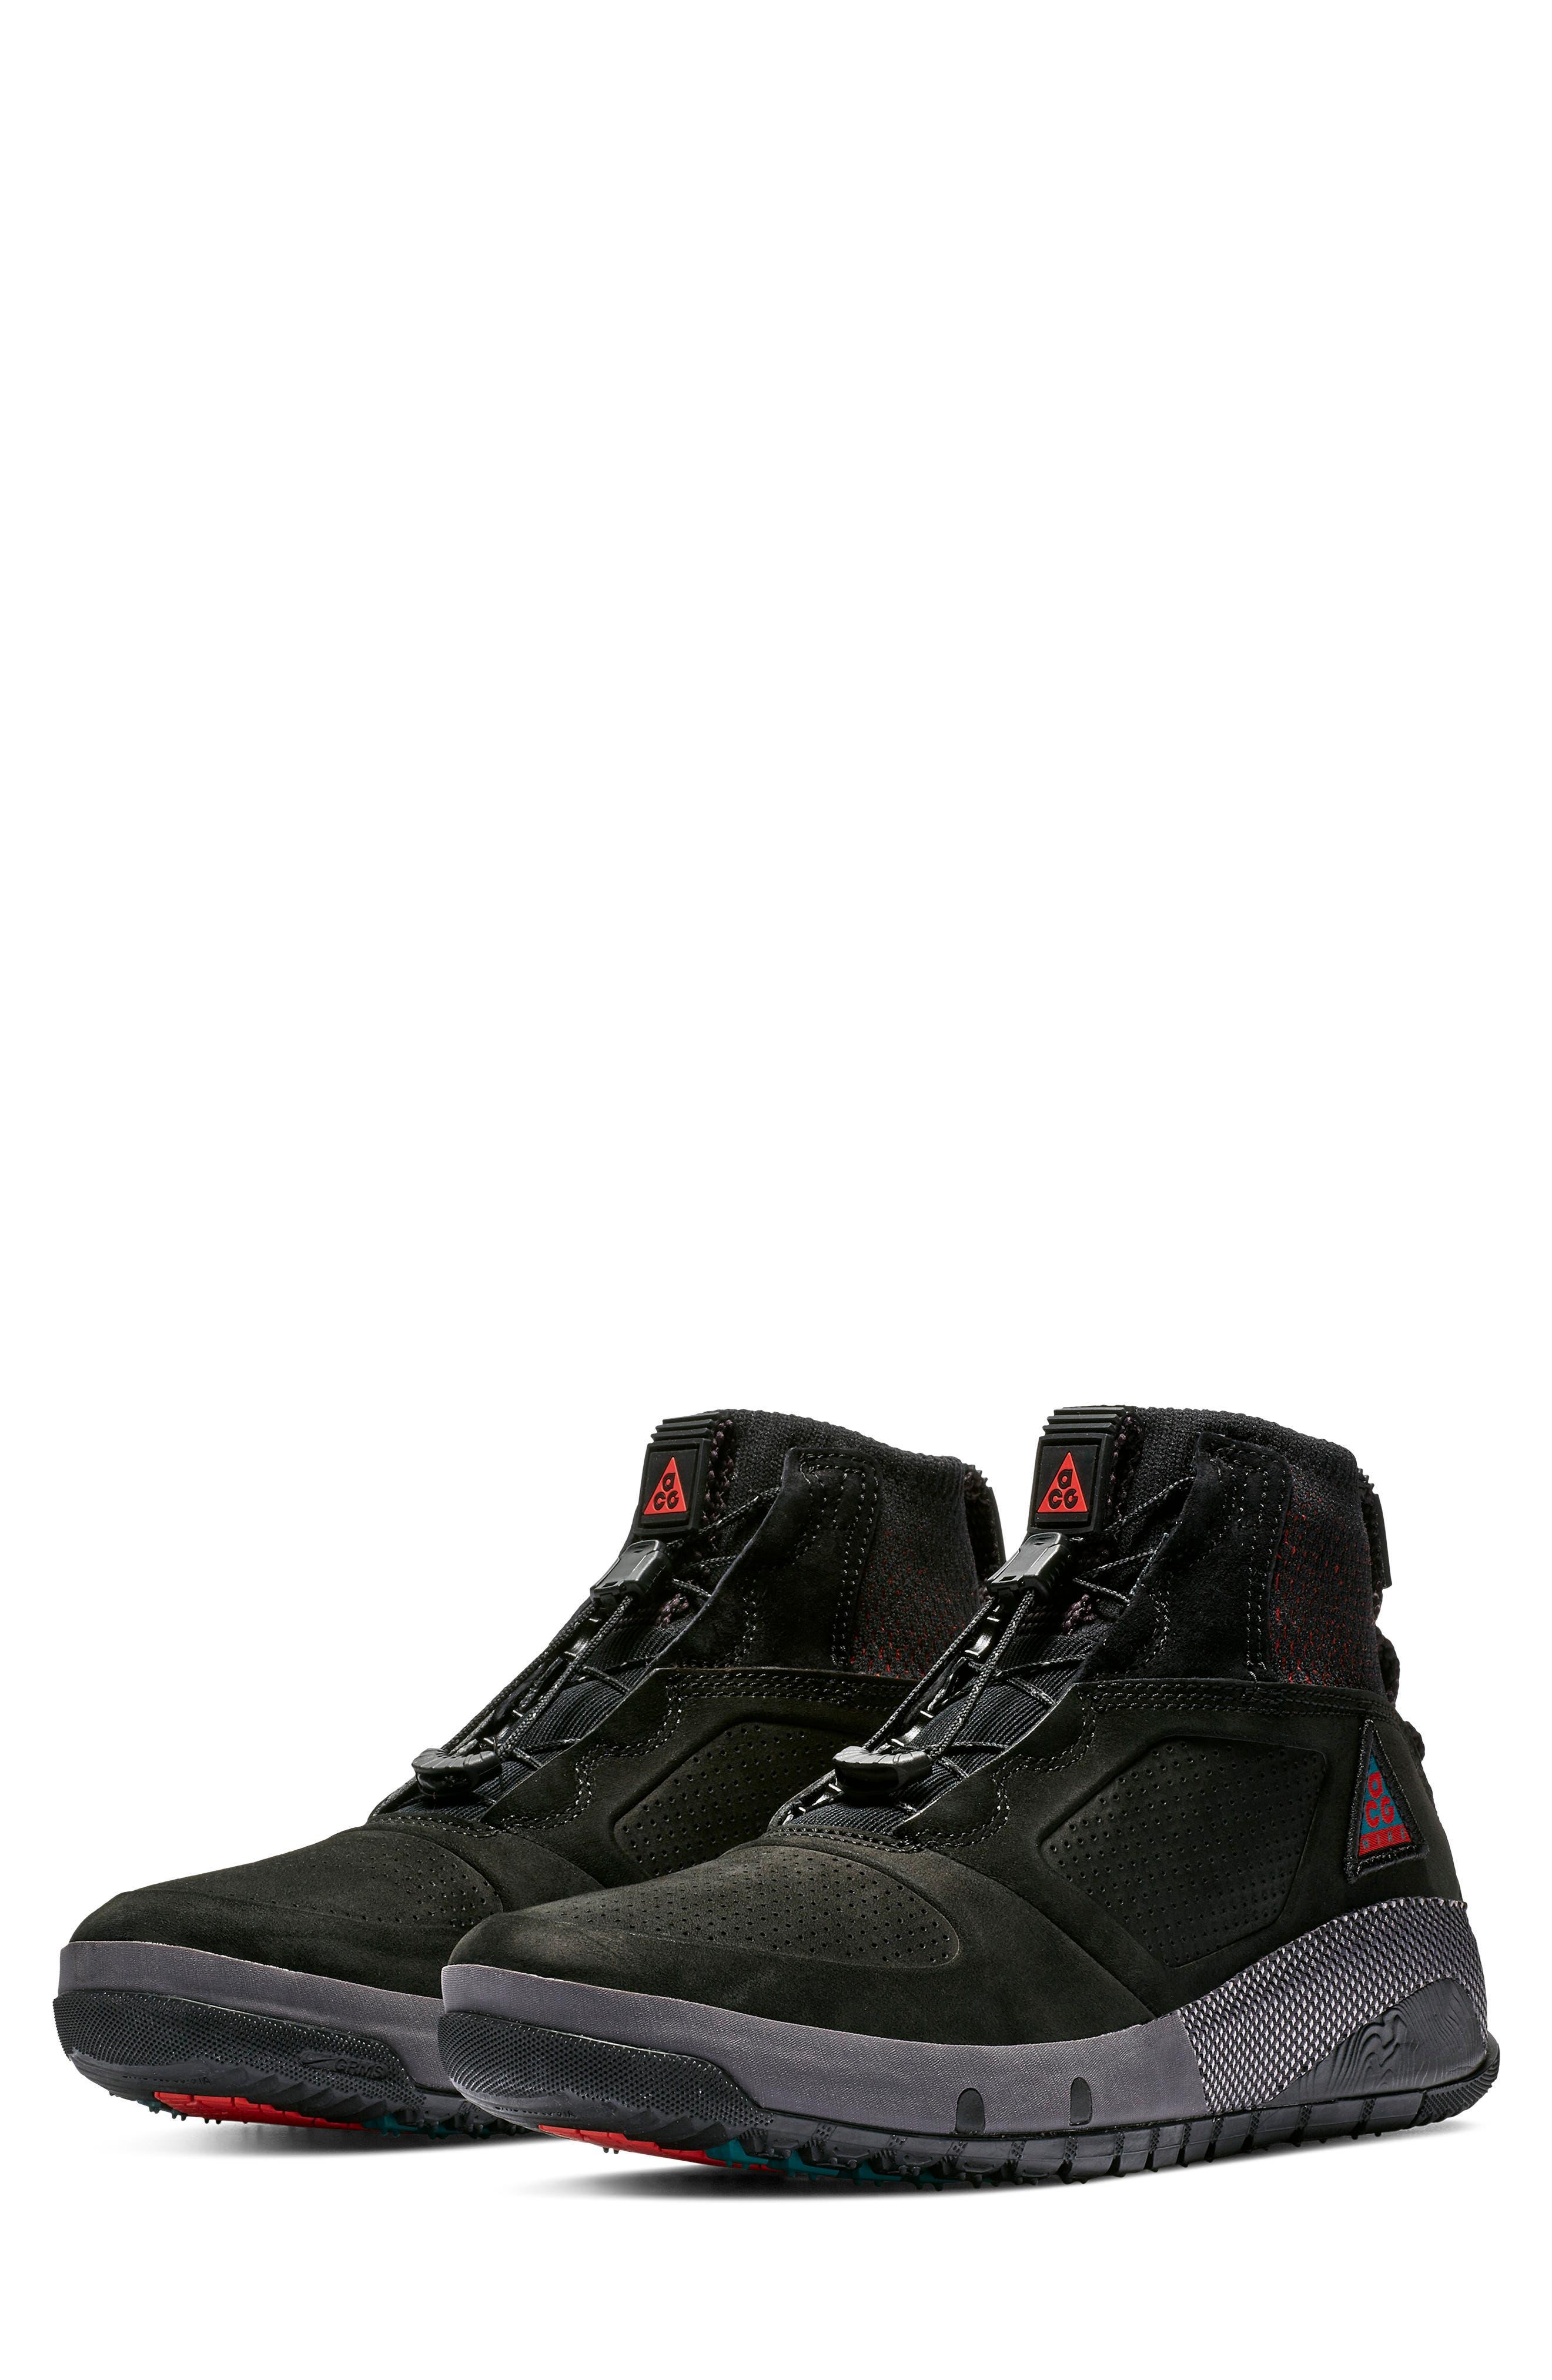 NIKE, ACG Ruckel Ridge Sneaker, Main thumbnail 1, color, 002